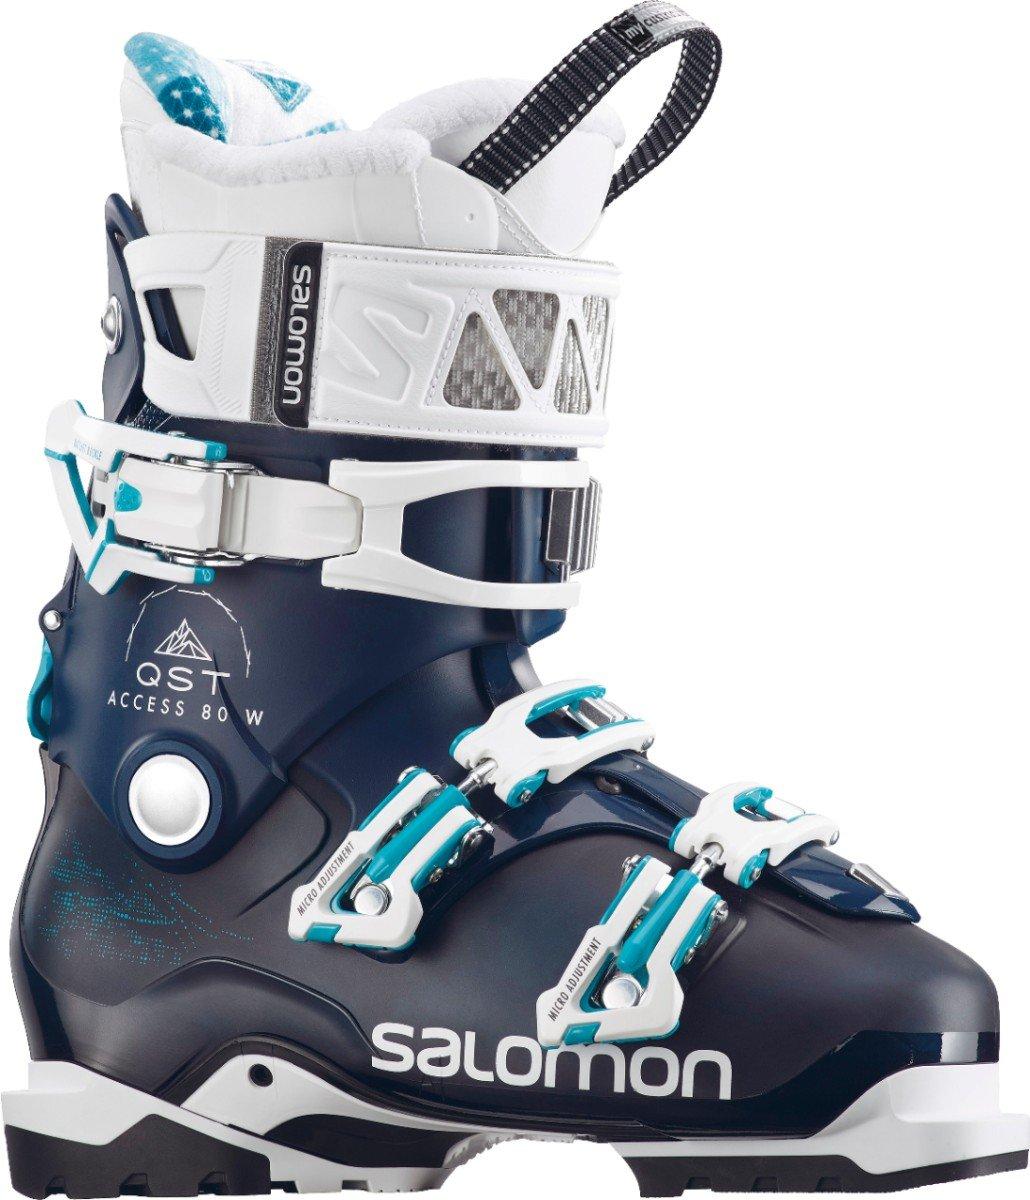 Salomon QST Access 80 W Ski Boots 2018